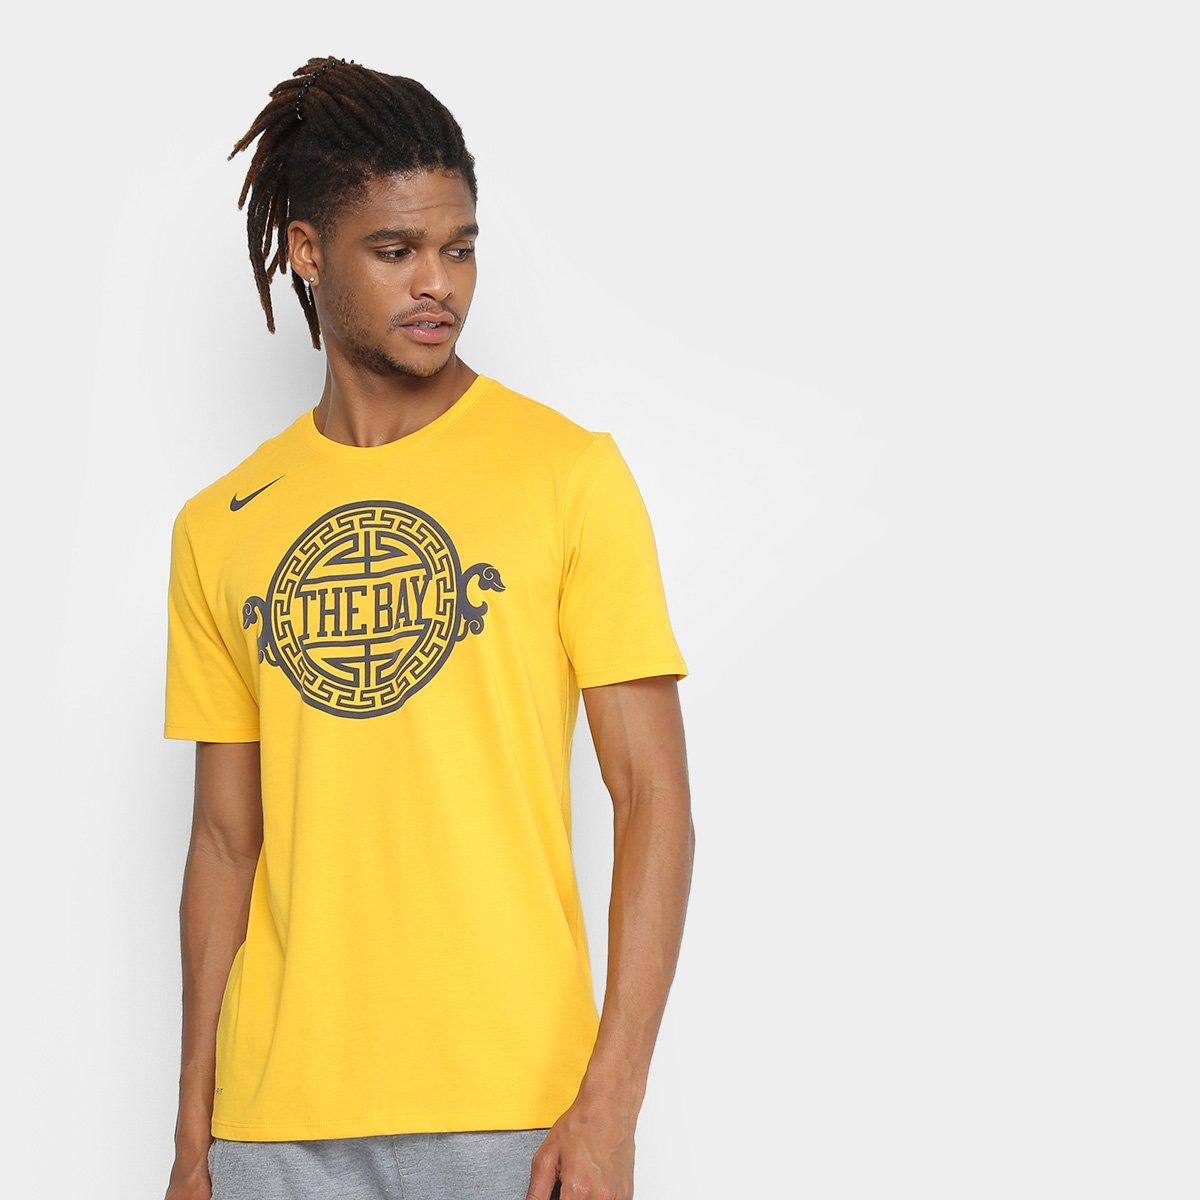 Camiseta NBA Golden State Warriors Nike Masculina - Dourado - Compre ... b41fe839b251f